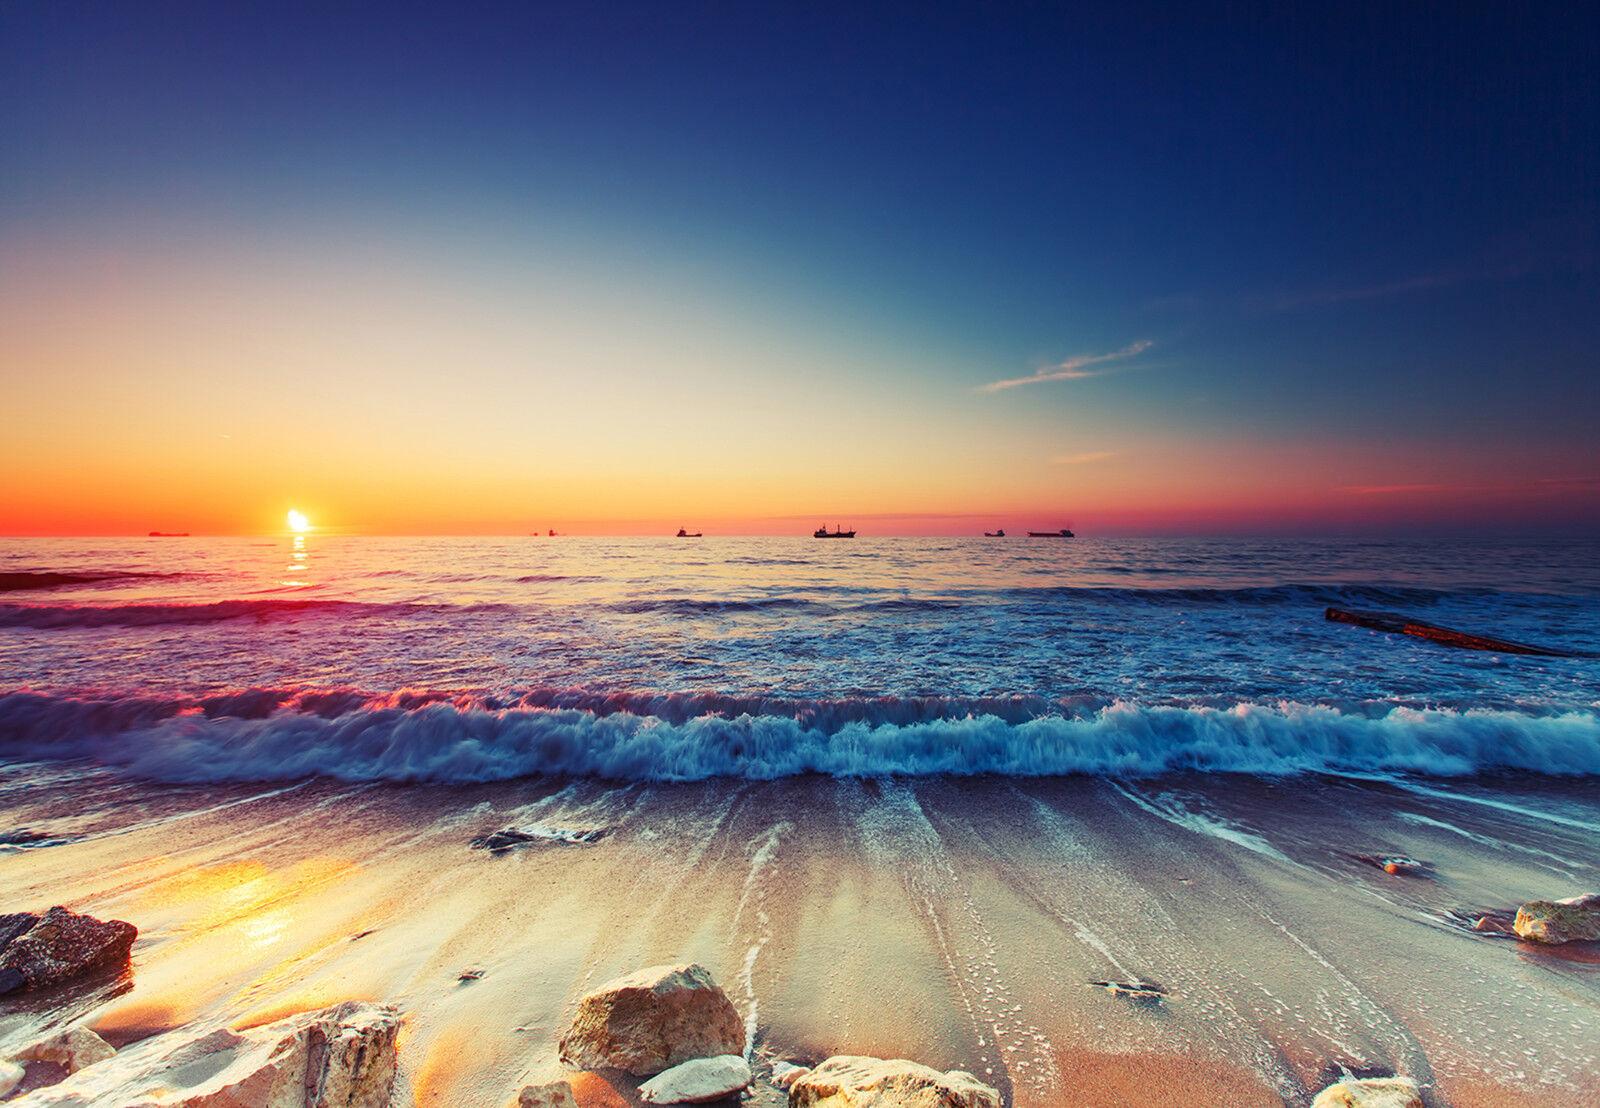 VLIES VLIES VLIES Fototapete-STRAND-(12623)-Wellen Sonnenuntergang Wolken Himmel Steine XXL 8085c1